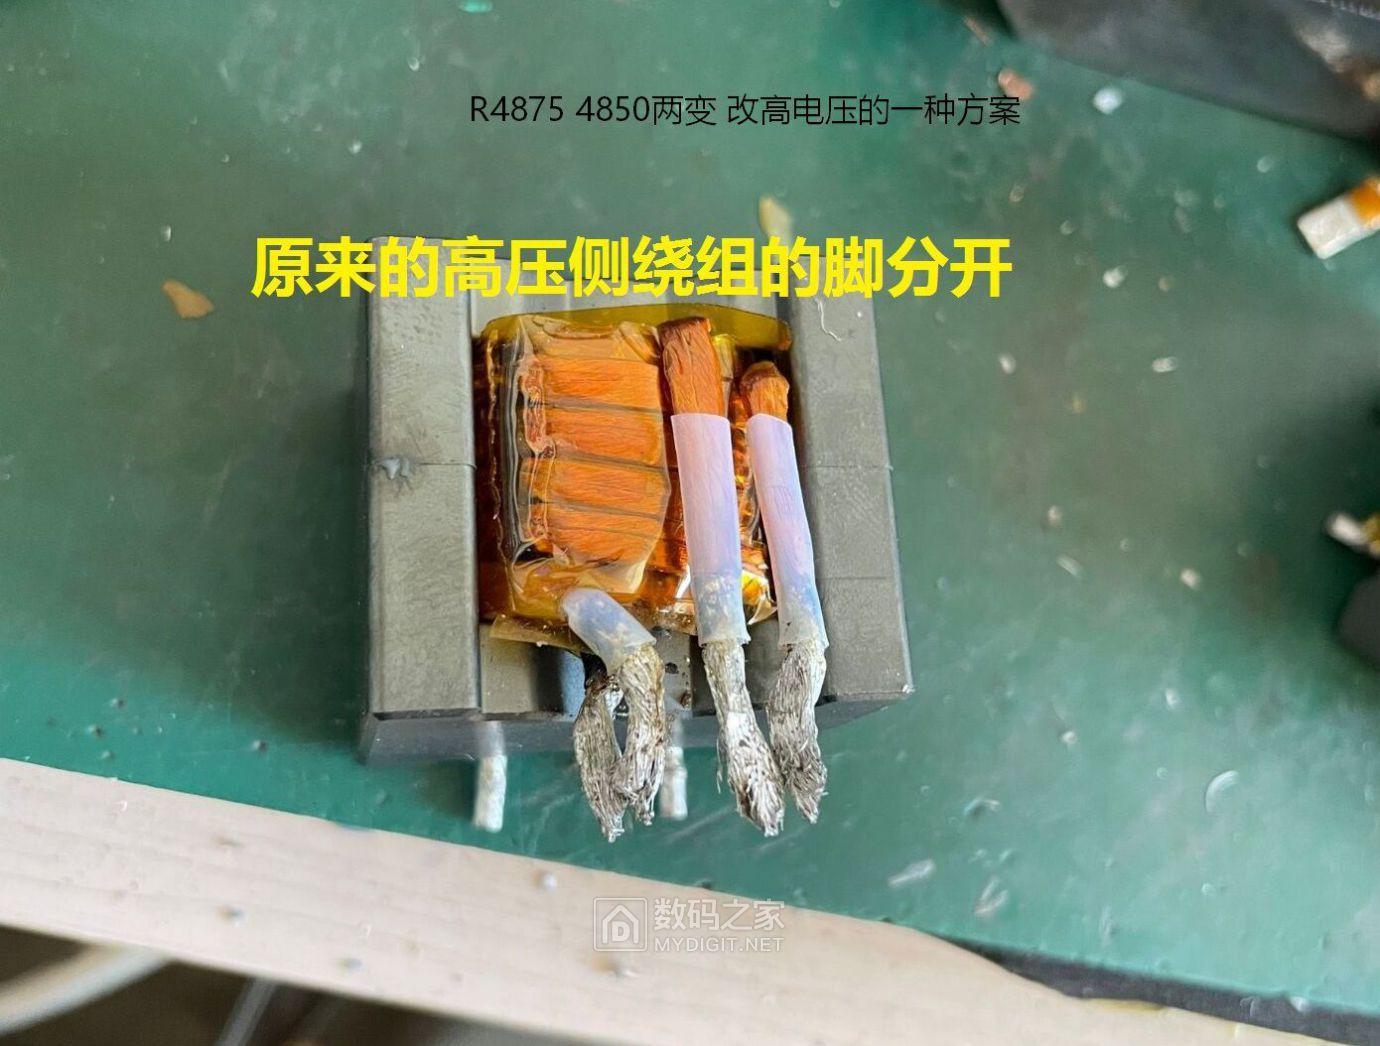 R4875 4850两变 改高电压的一种方案3.jpg